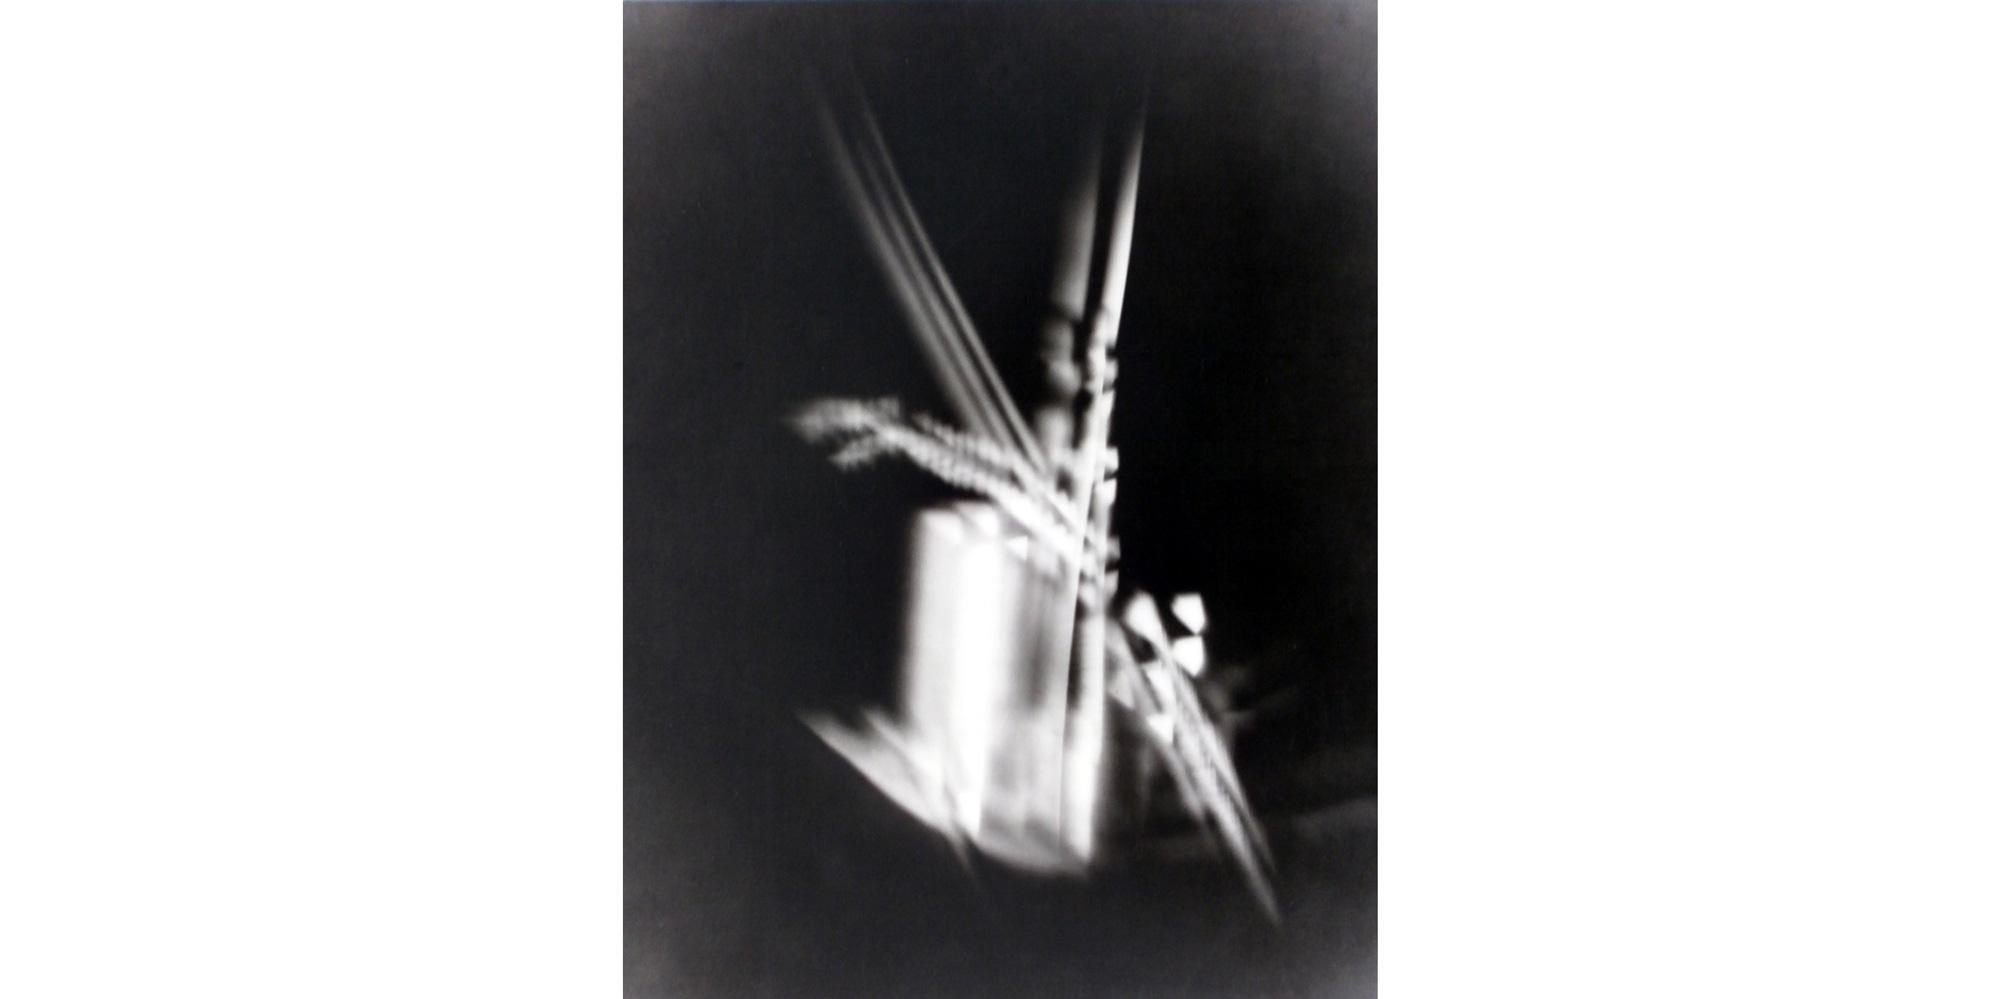 Jaroslav Rossler: Untitled (Optical study), 21 x 27 cm, 1947 / 2006, Ed. 3/3